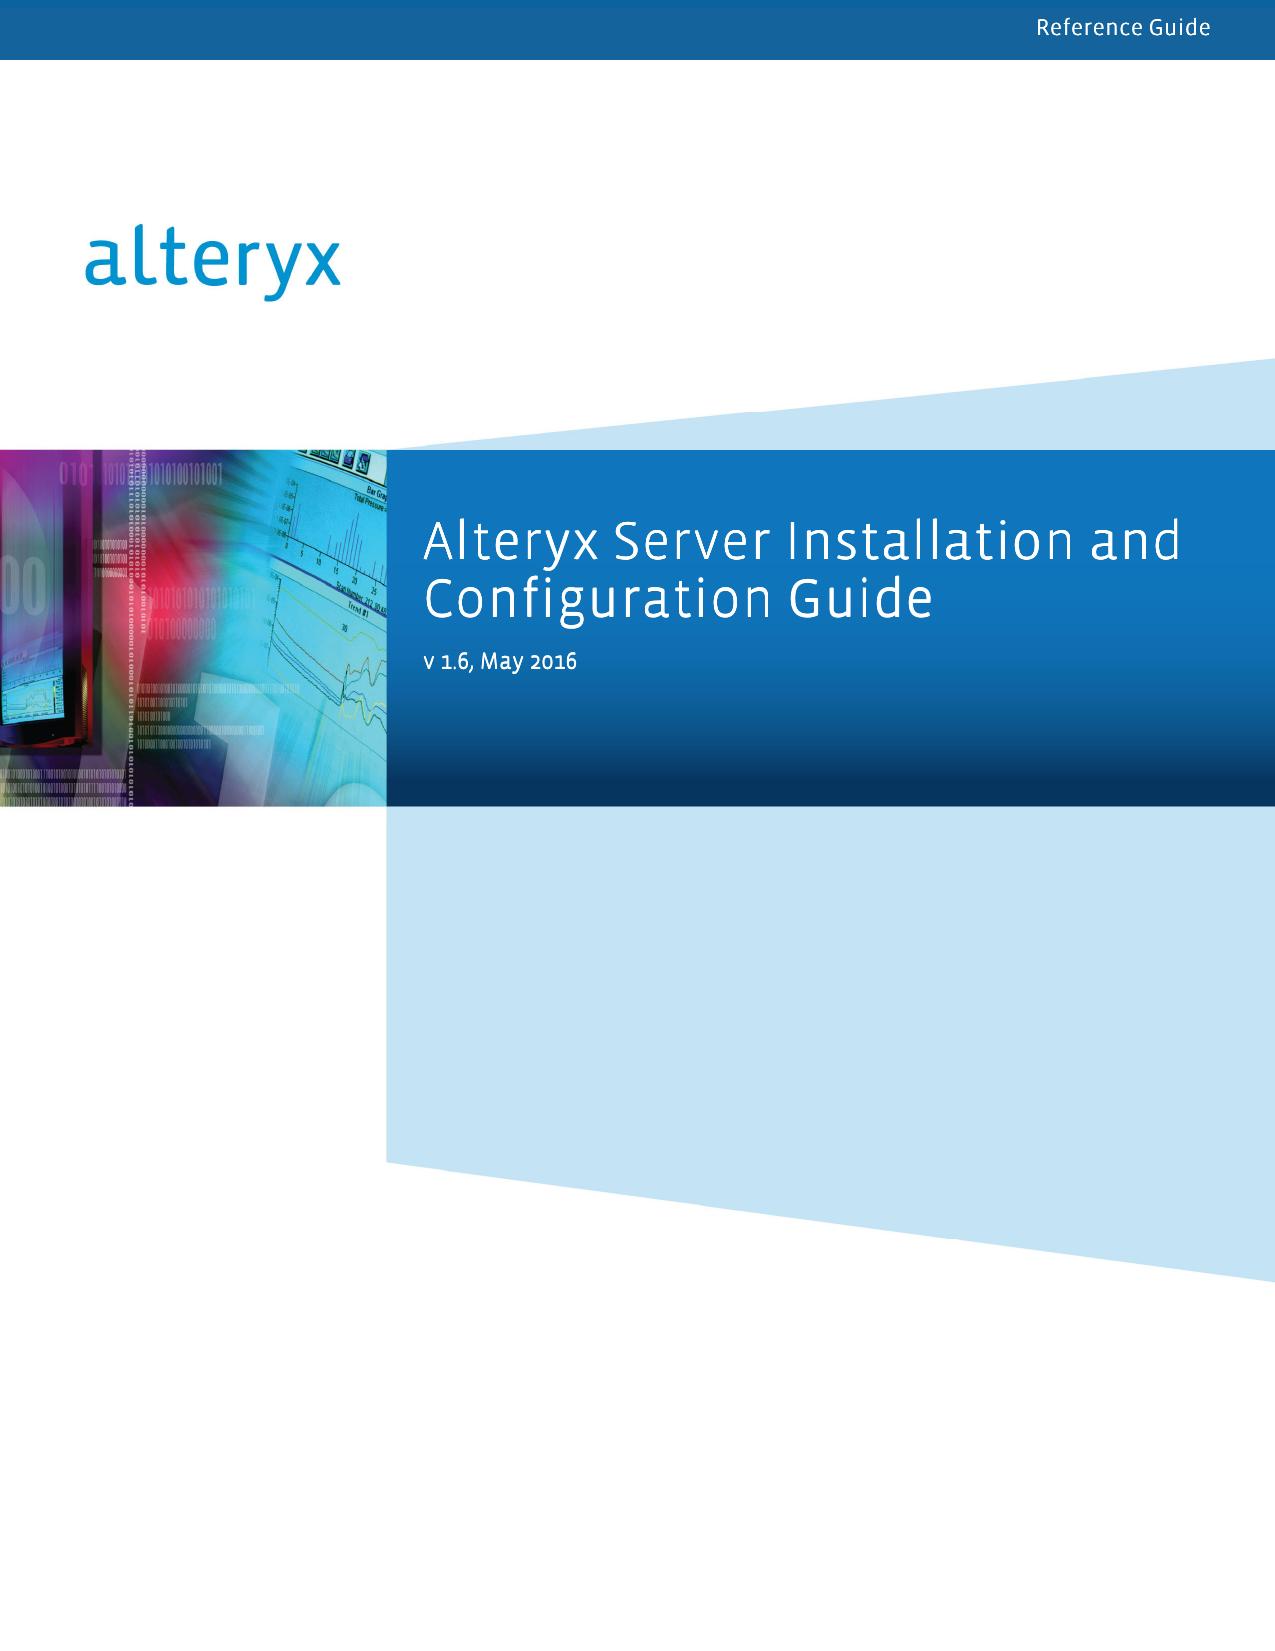 Alteryx Server Installation and Configuration Guide Configuration